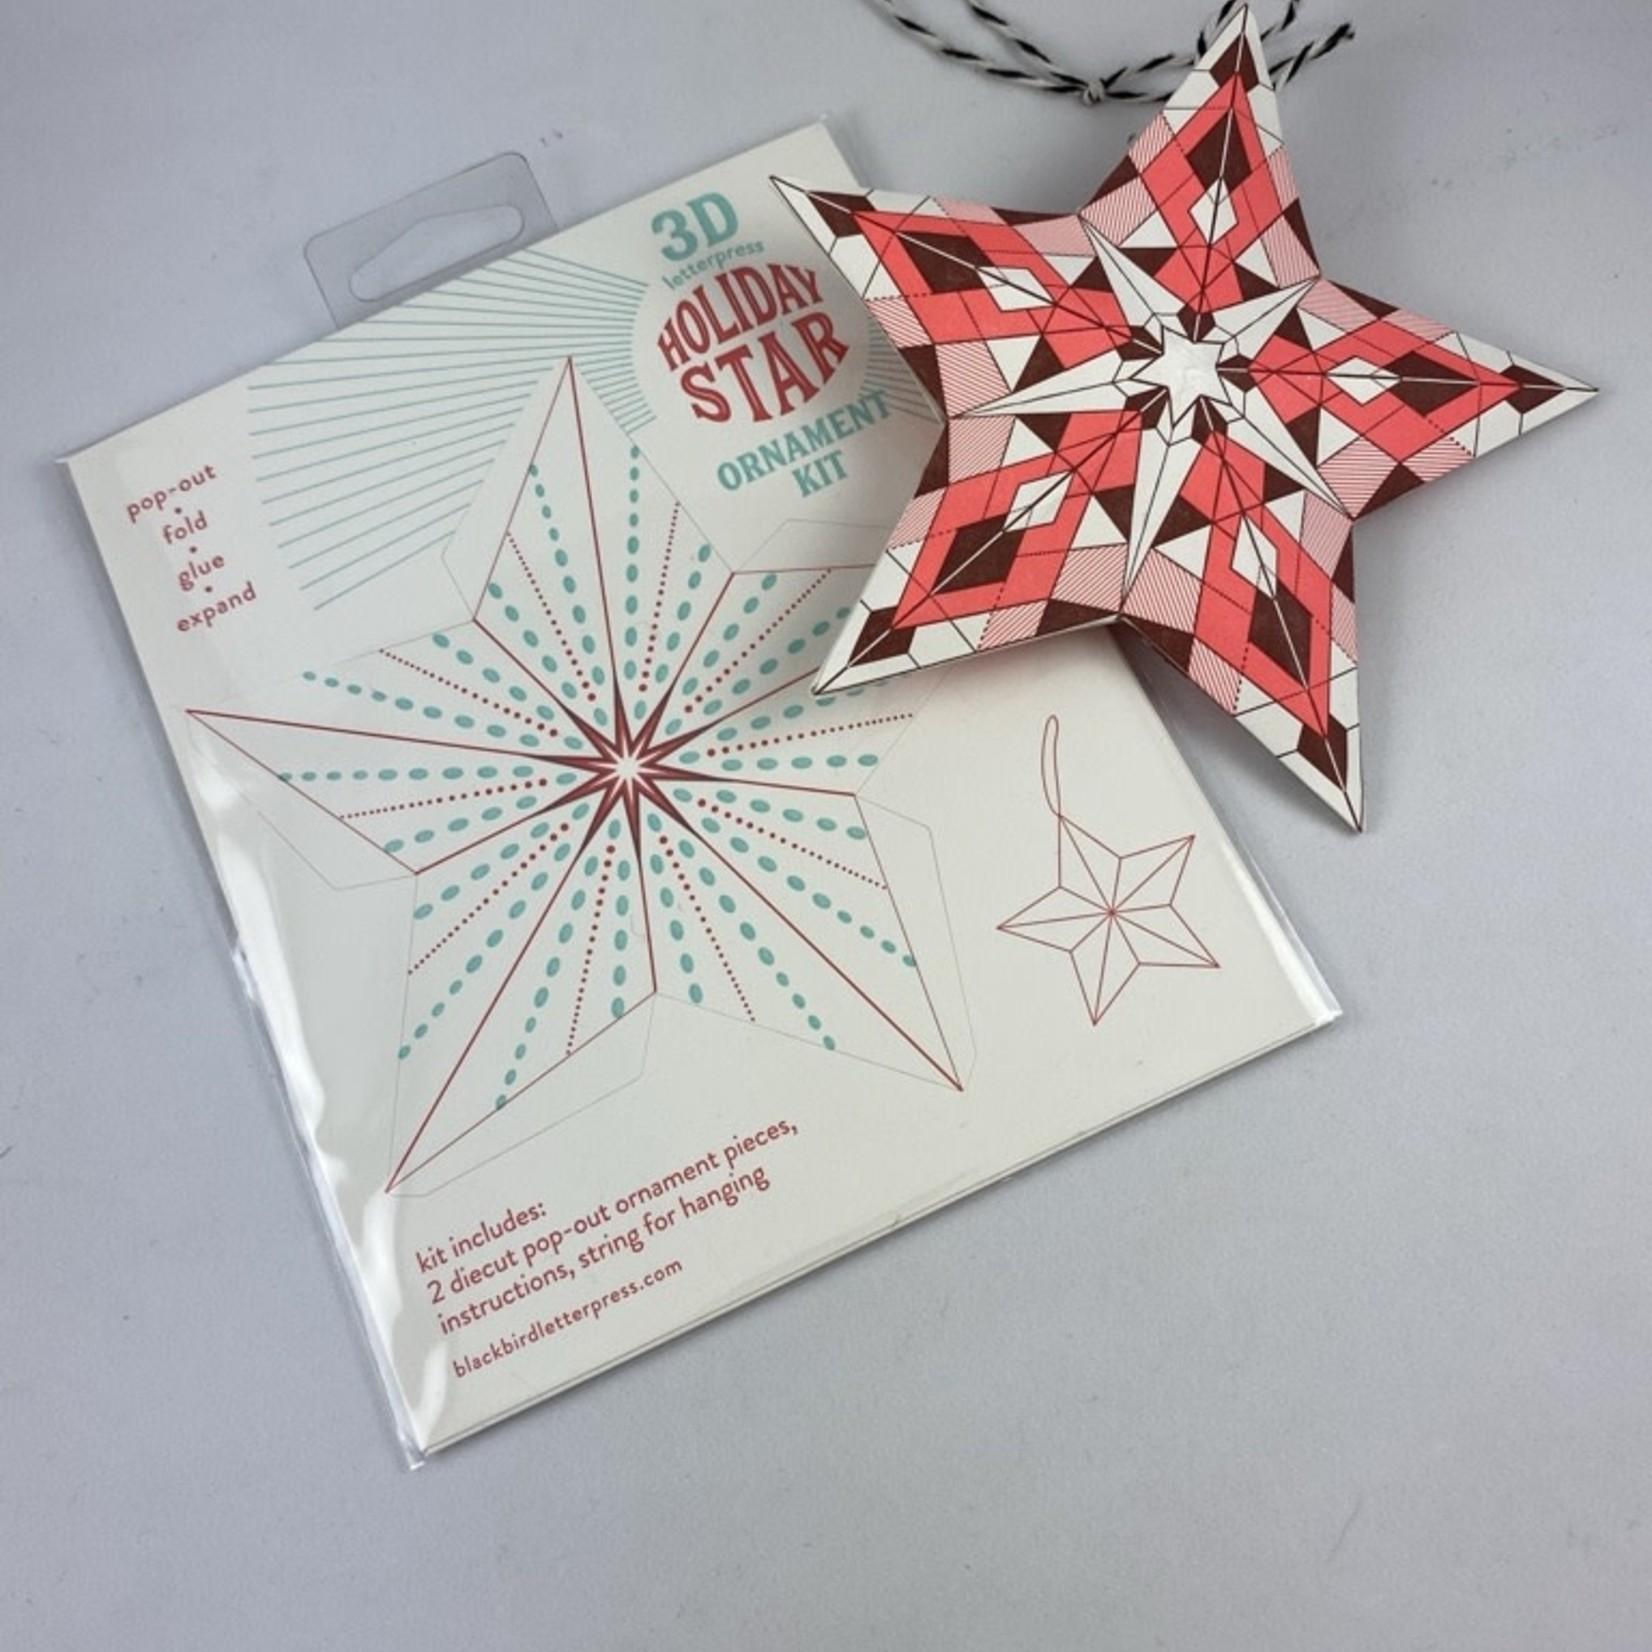 Blackbird Letterpress Dotted Star DIY Ornament Kit